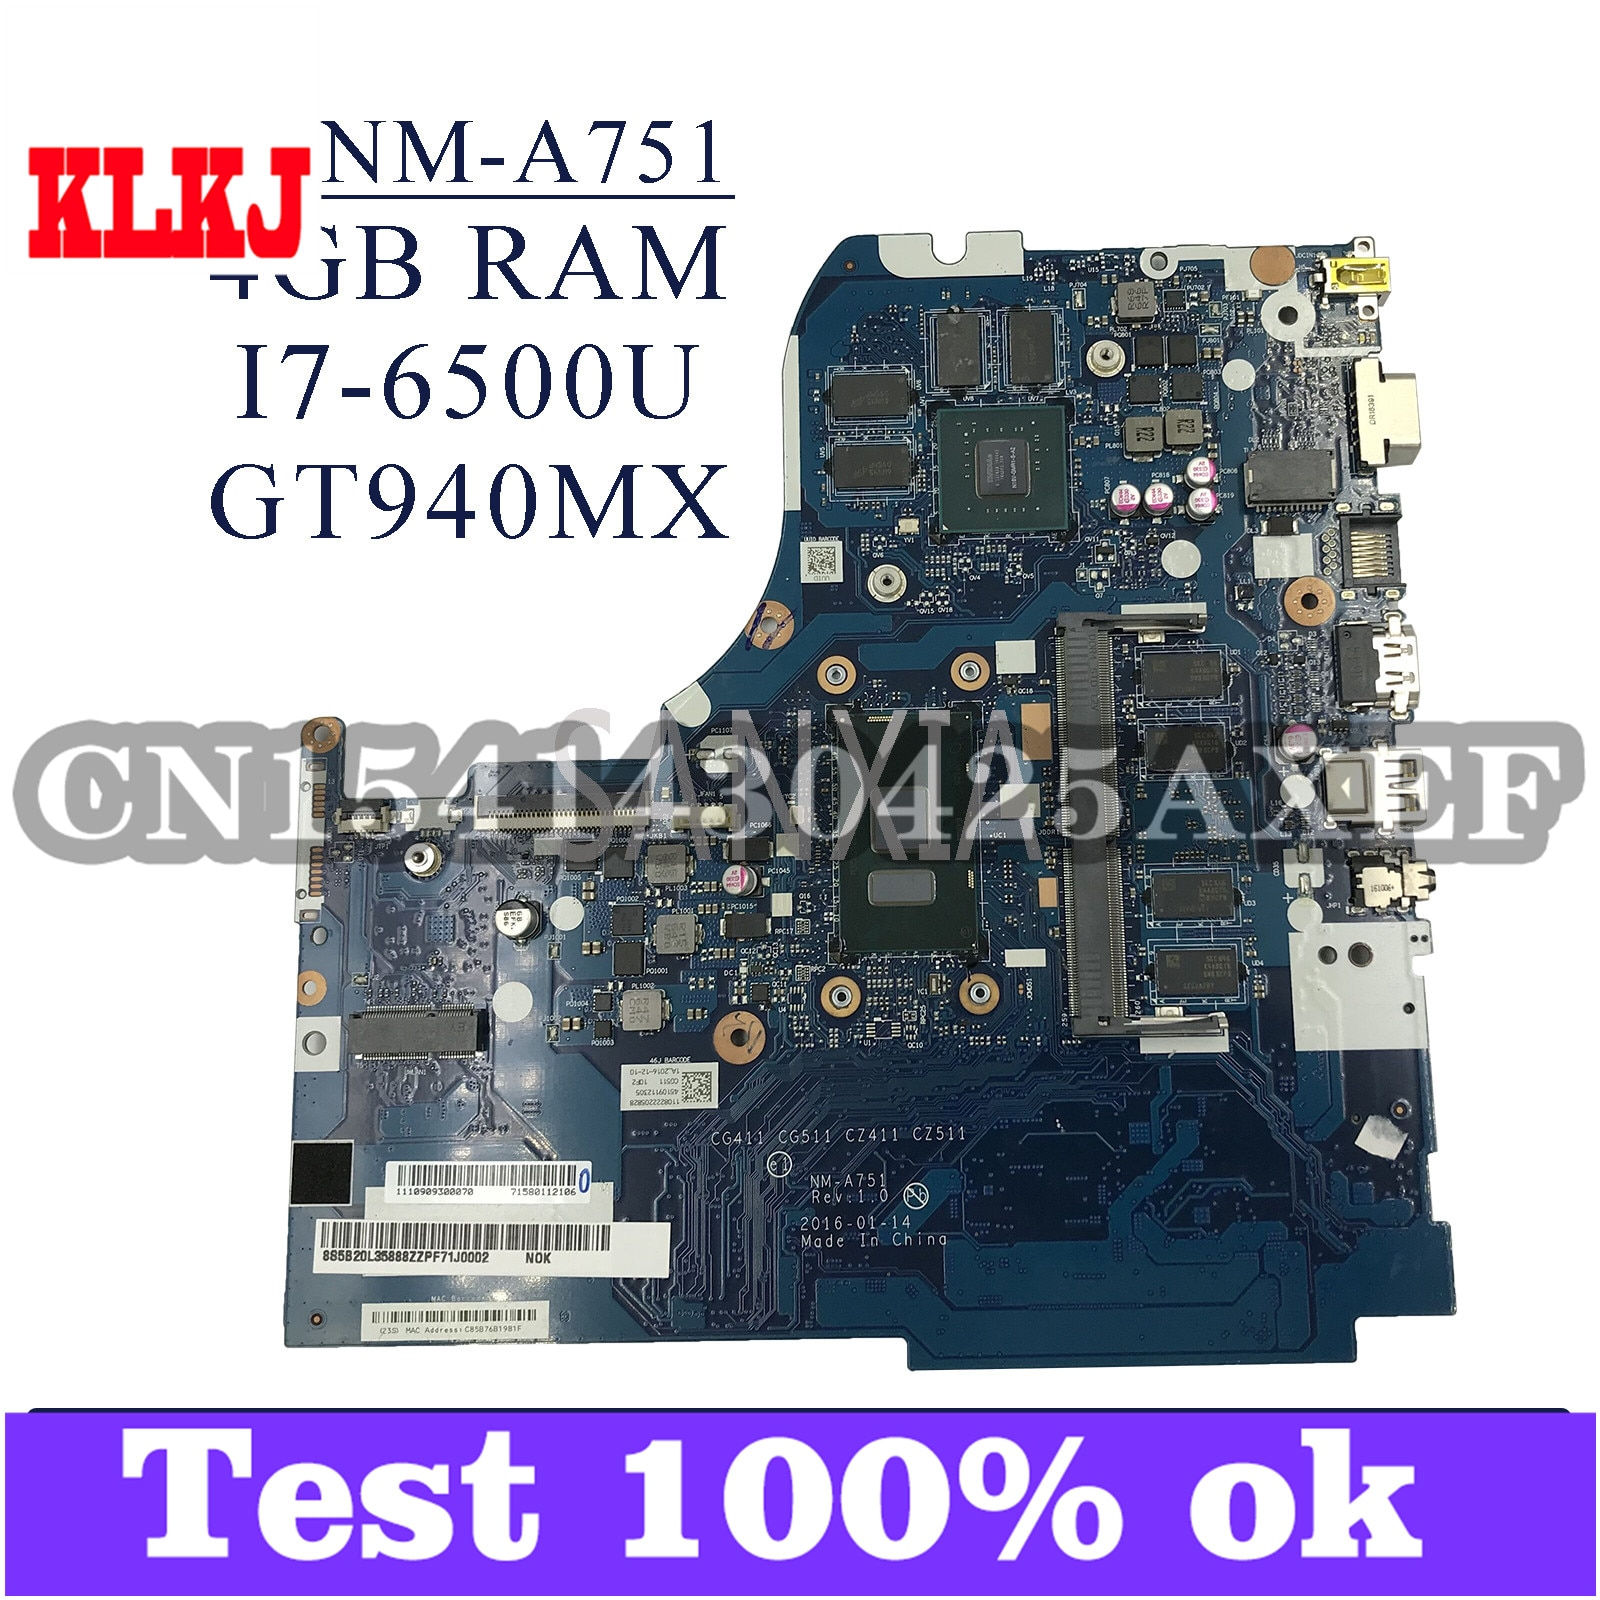 KLKJ NM-A751 اللوحة الأم لأجهزة الكمبيوتر المحمول لينوفو 310-15ISK 310-15IKB اللوحة الرئيسية الأصلية 4GB-RAM I7-6500U GT940MX-2GB